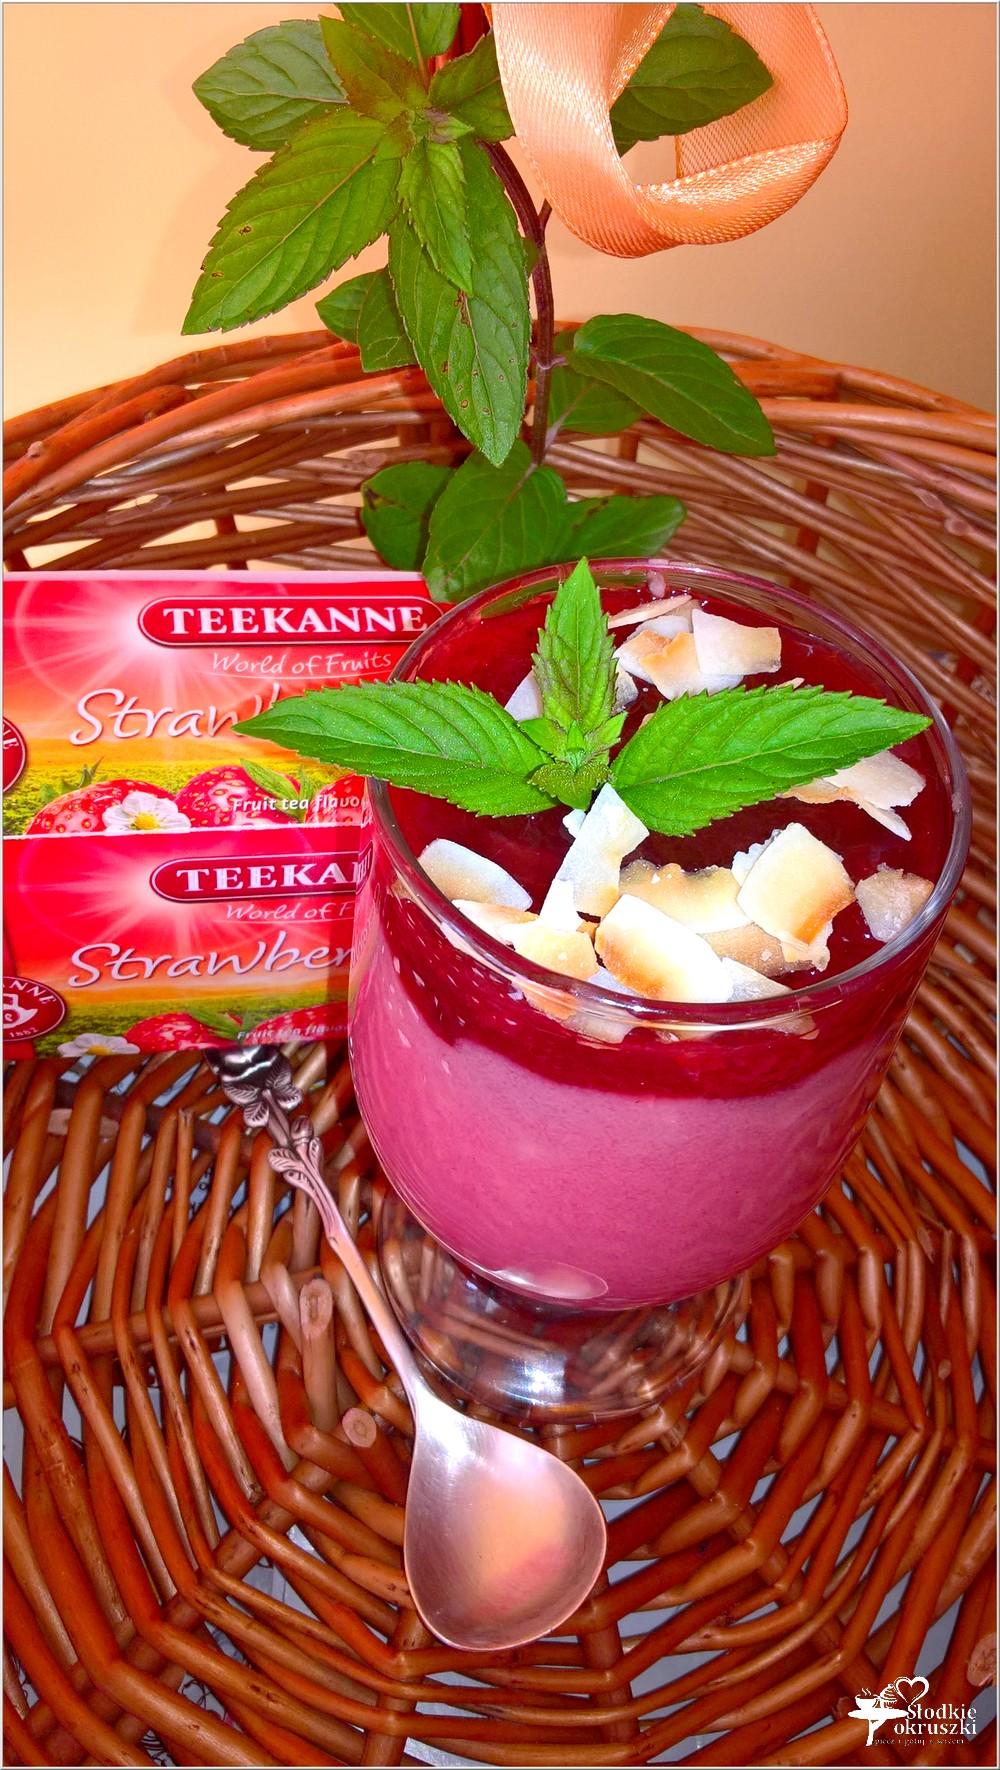 Kremowy deser herbaciano-owocowy (2)